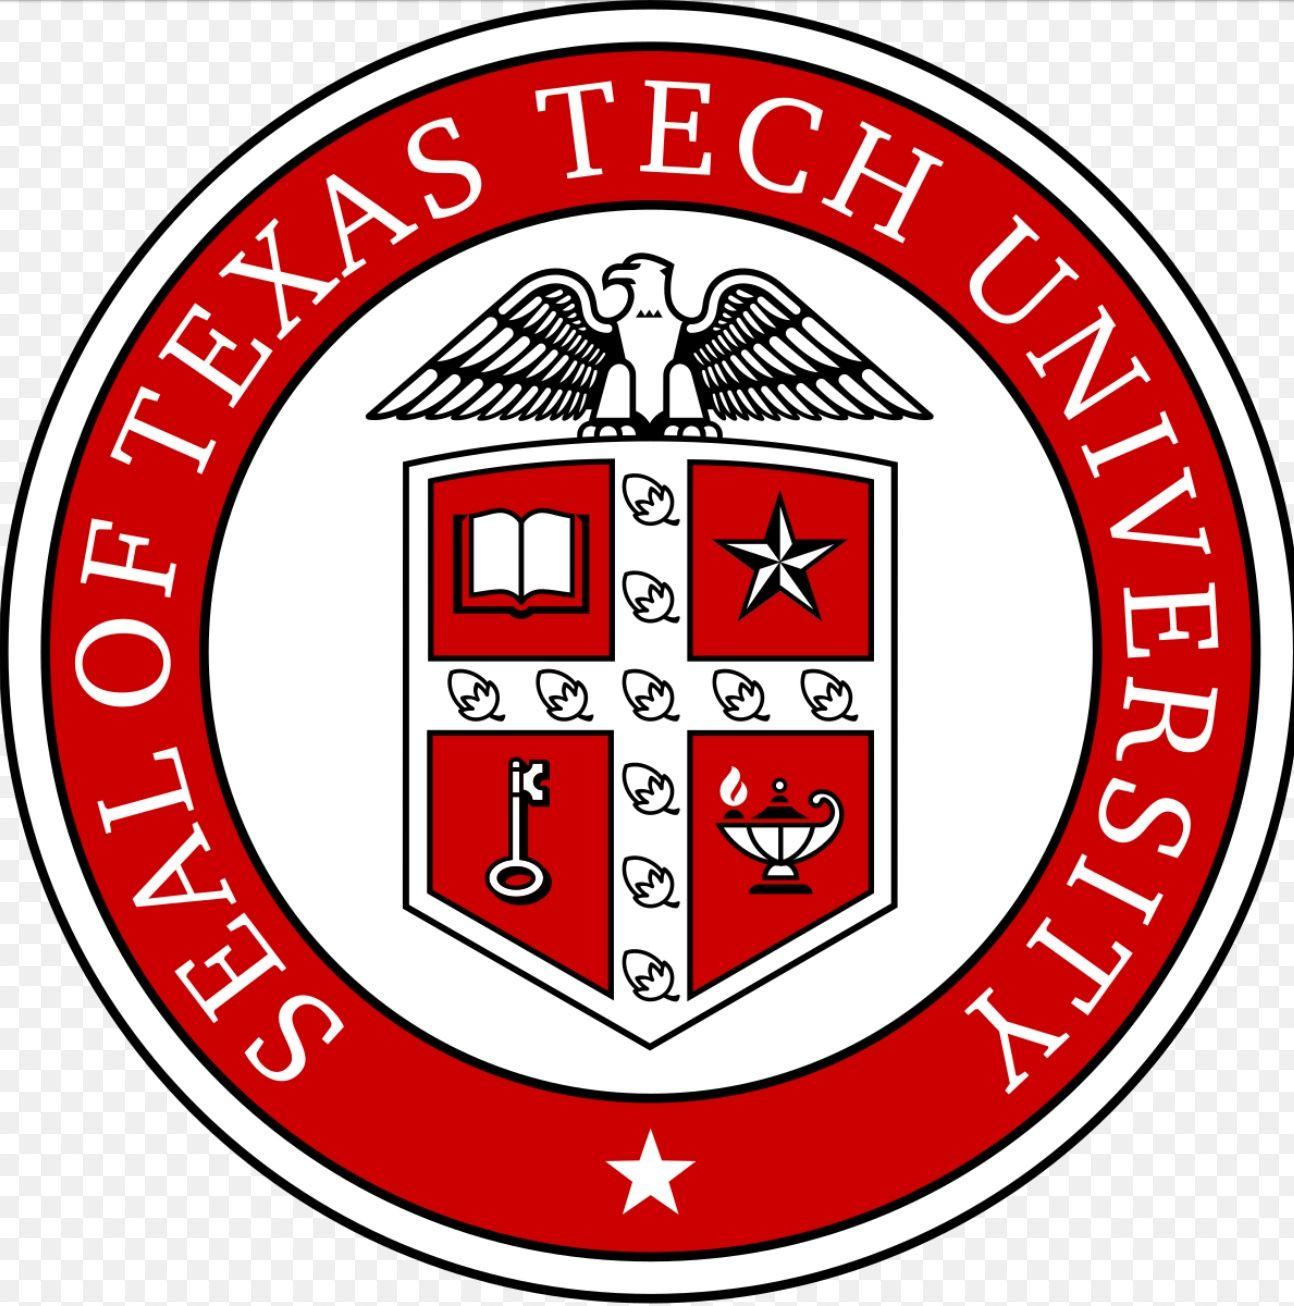 Texas Tech Online High School >> Pin By Shannon Schulman On Texas Tech Texas Tech